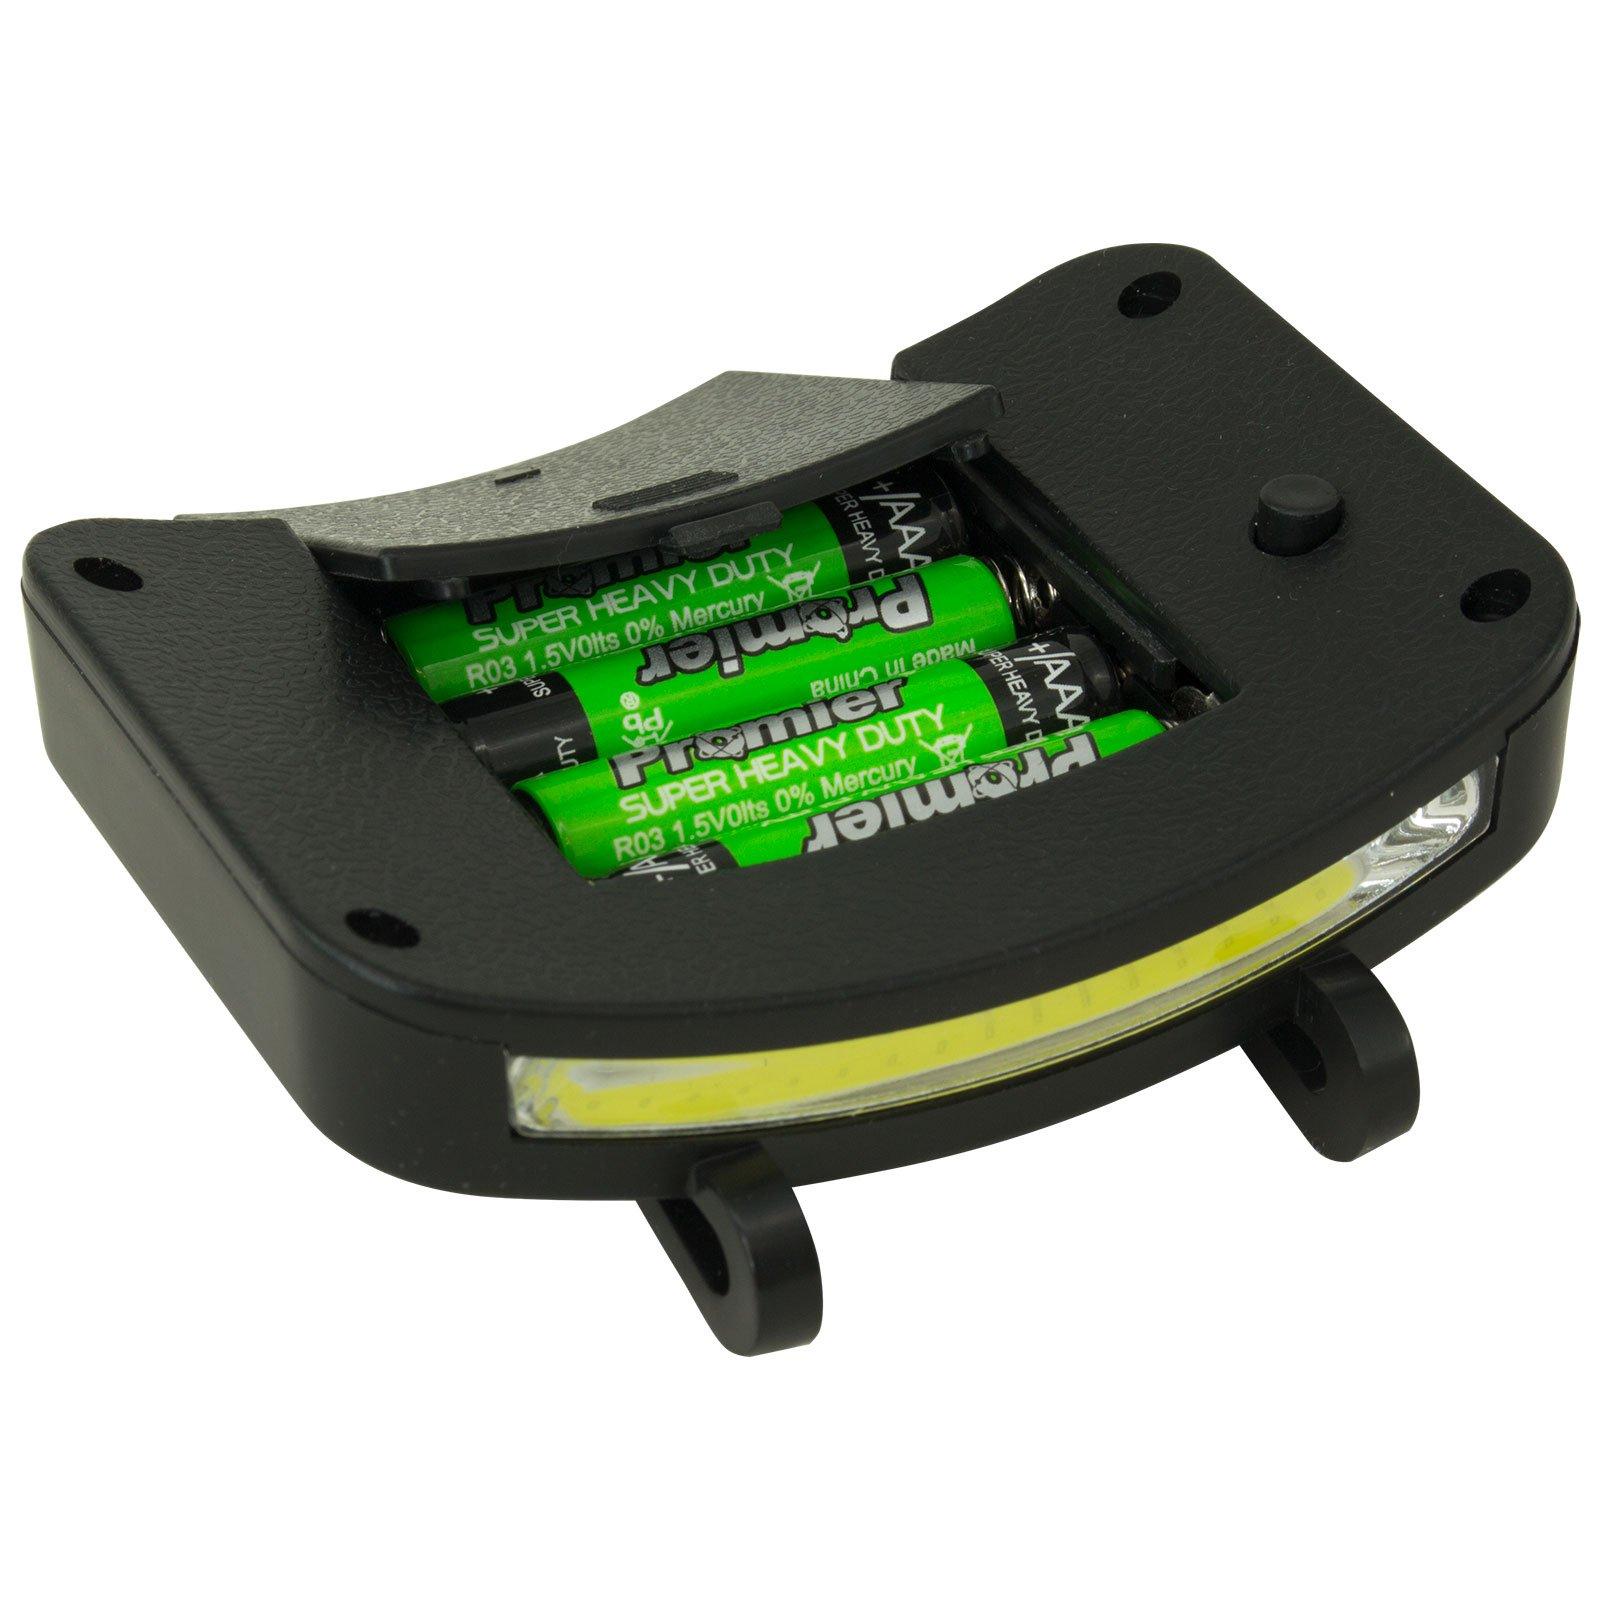 2 PACK - 400 Lumen Hi Mode / 180 Lumen Low Power Mode (2 X Cap Lights > 2 X Power & 2 X Bright) COB LED Clip On Cap Light DOUBLE BRIGHT (100% MFG Guarantee) (Black) by Apollo's Products (Image #8)